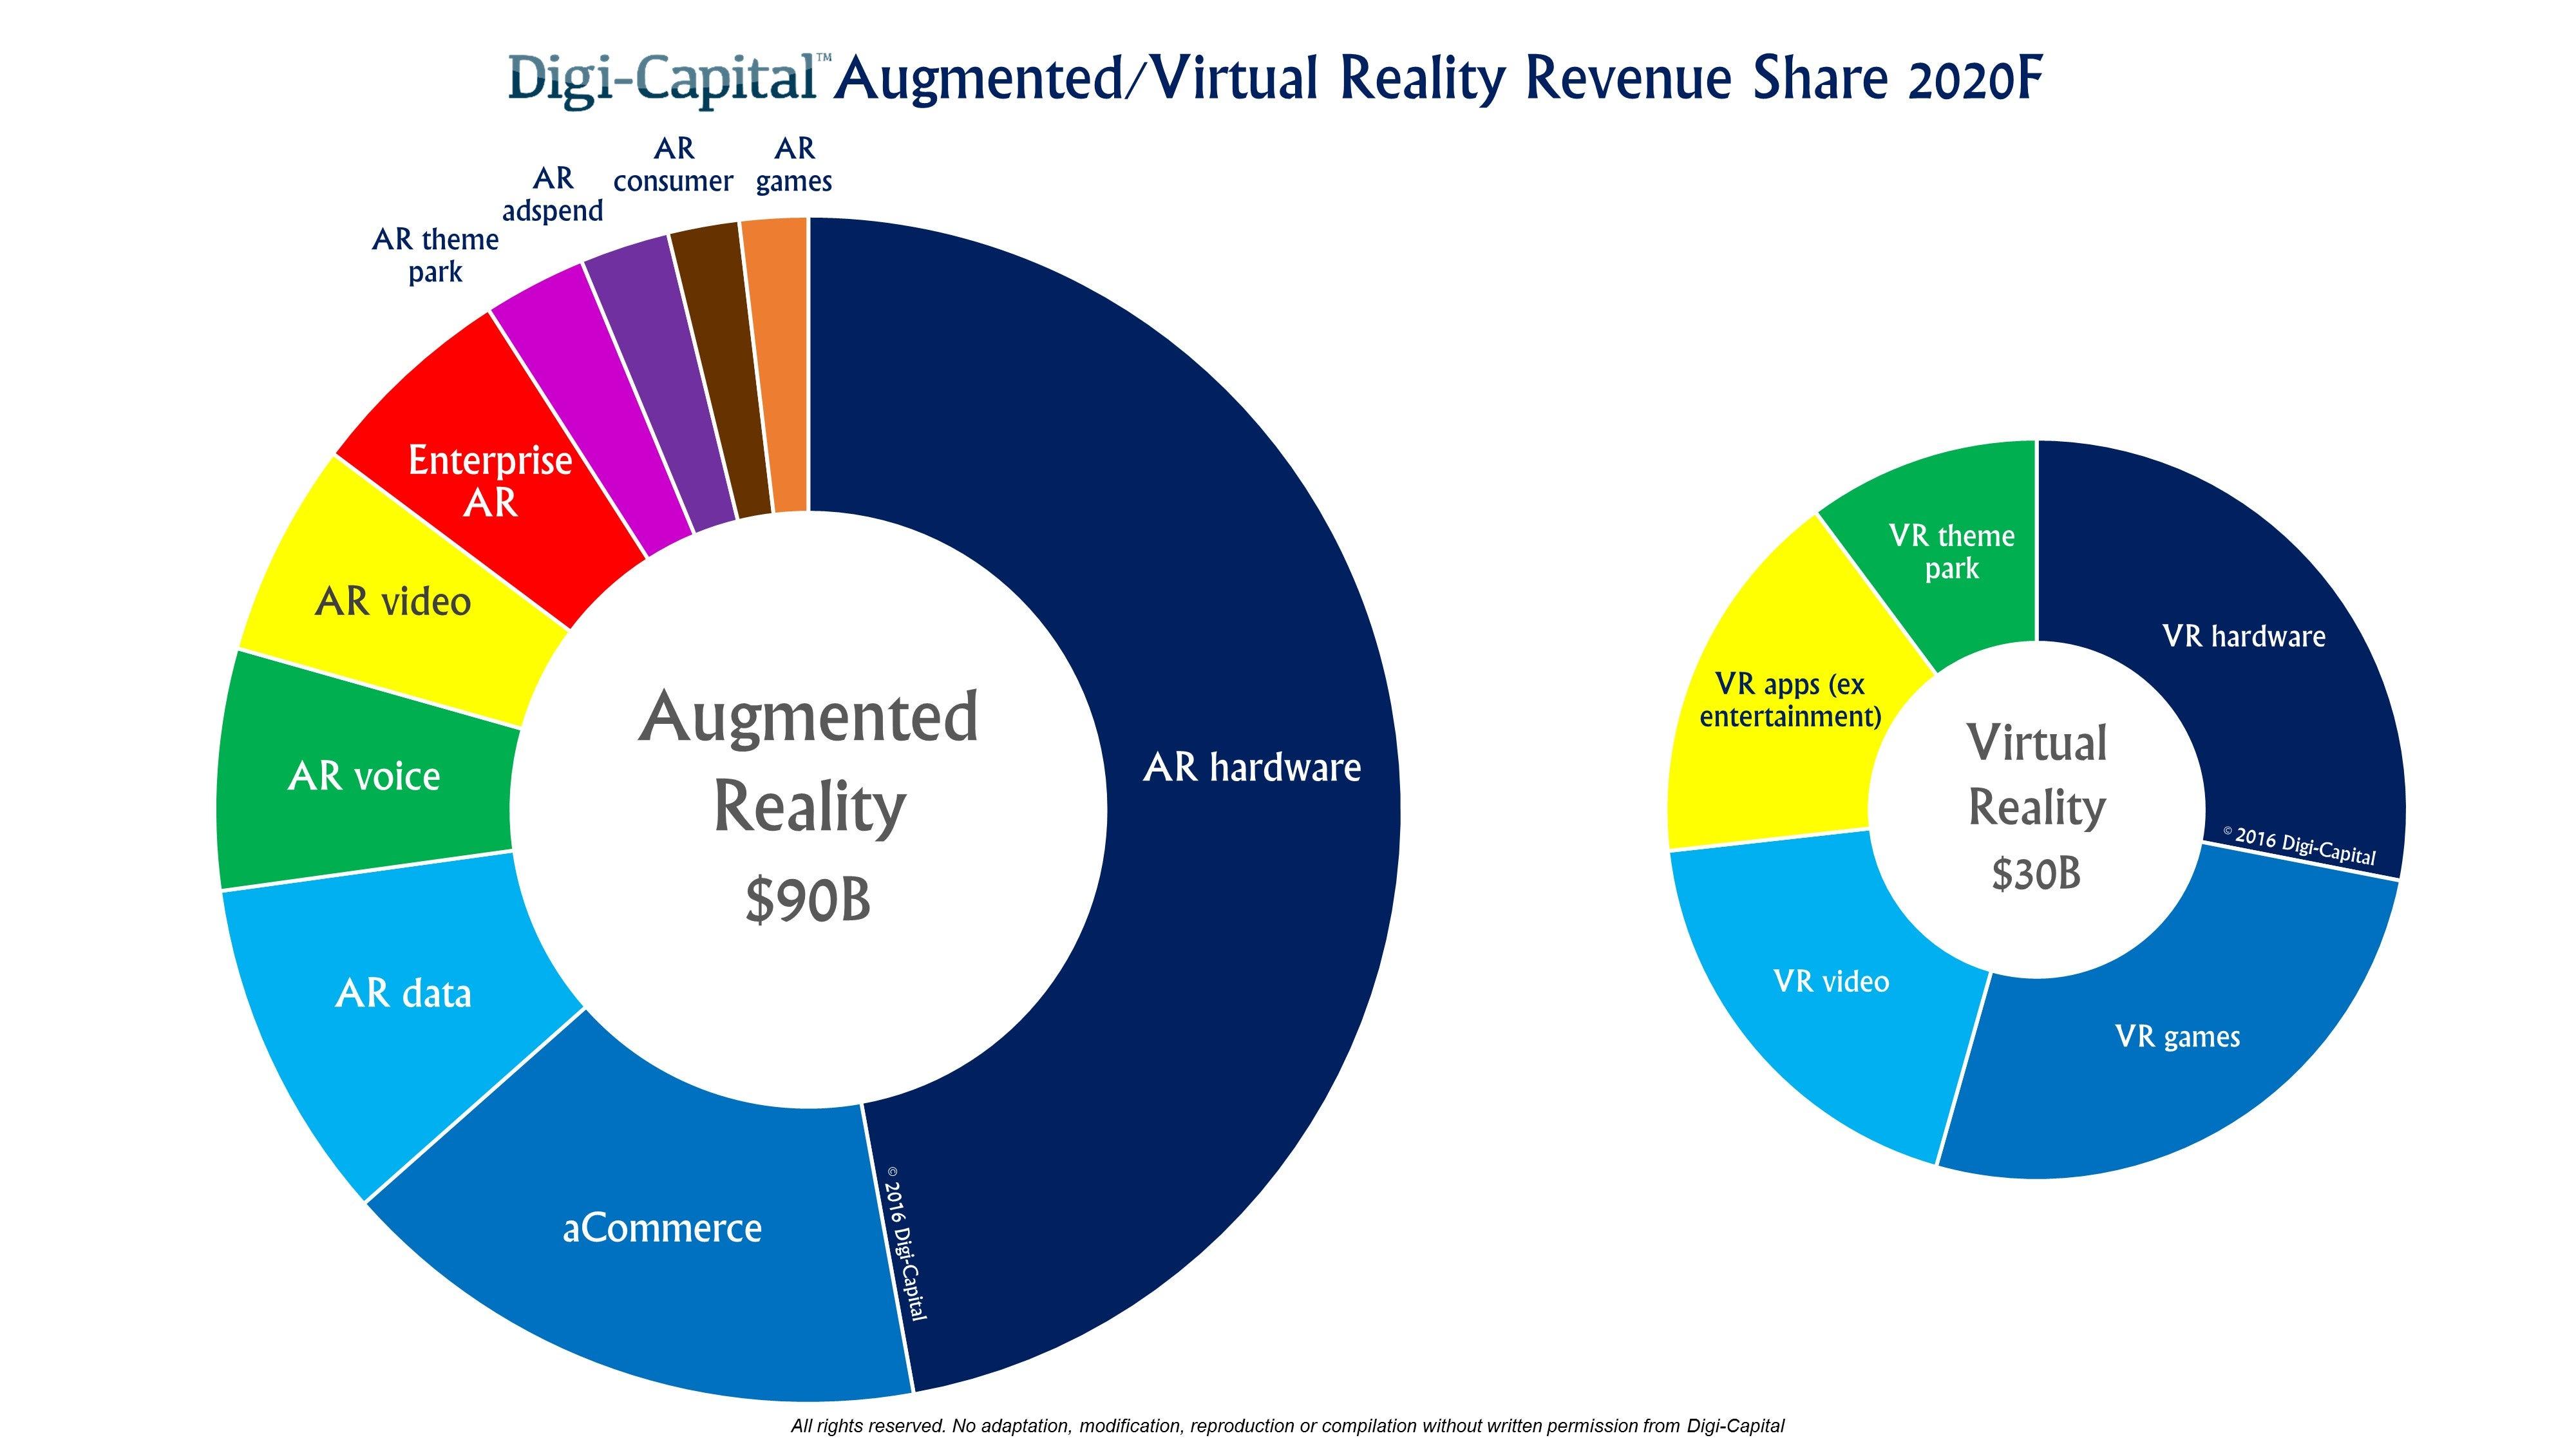 digi-capital-arvr-sector-forecast-2020.jpg